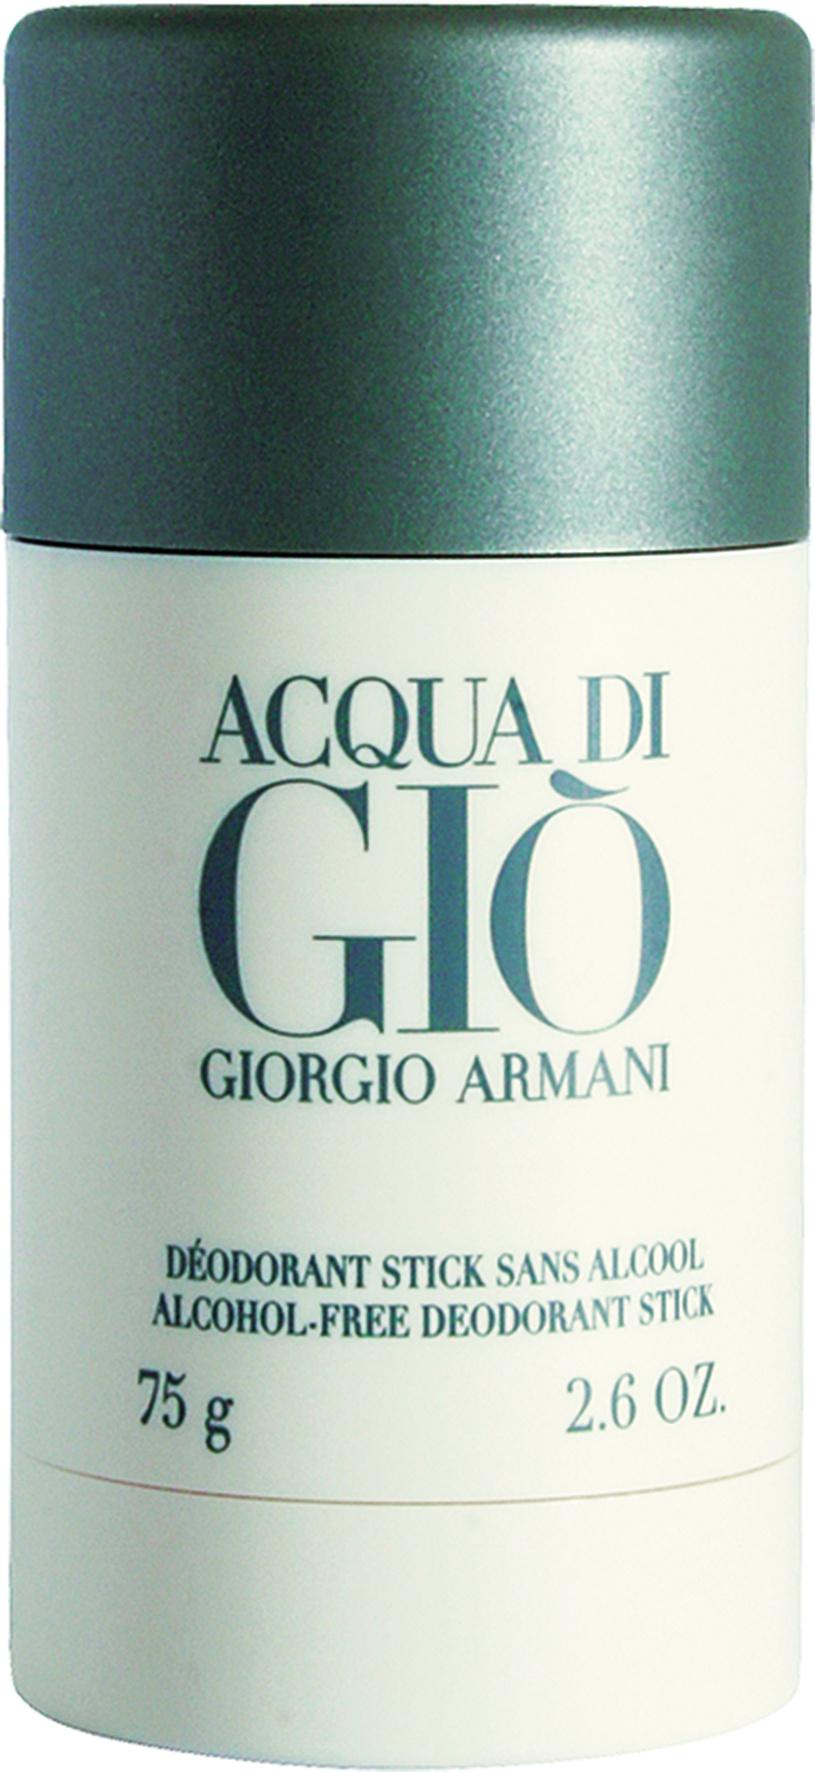 Giorgio Armani Acqua Di Giò Pour Homme Deostick, 75 ml